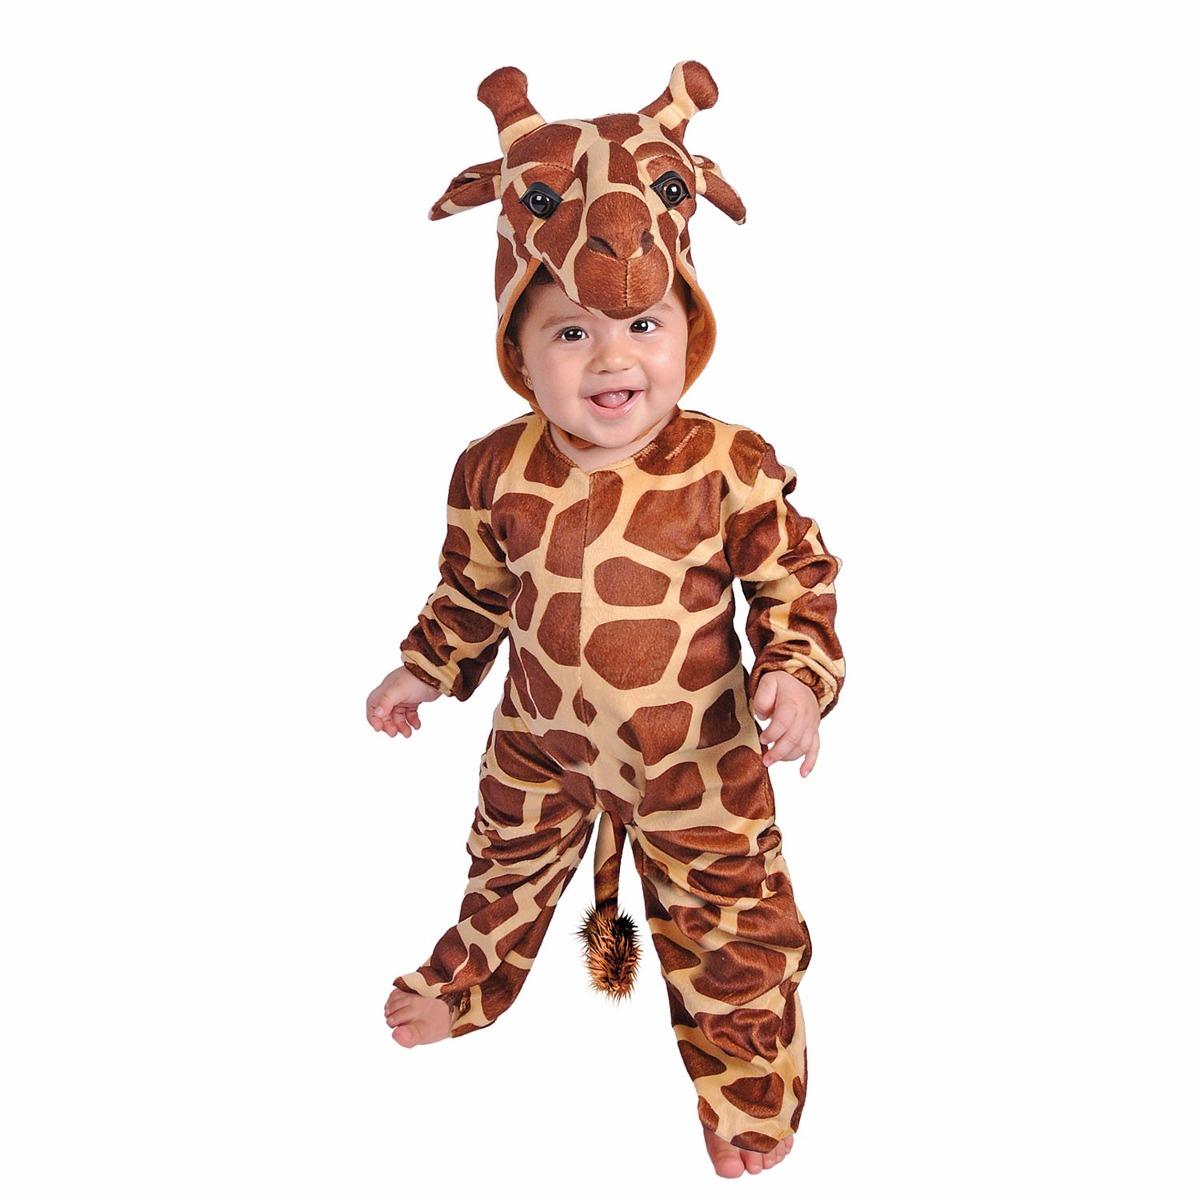 disfraces para ninos de jirafa